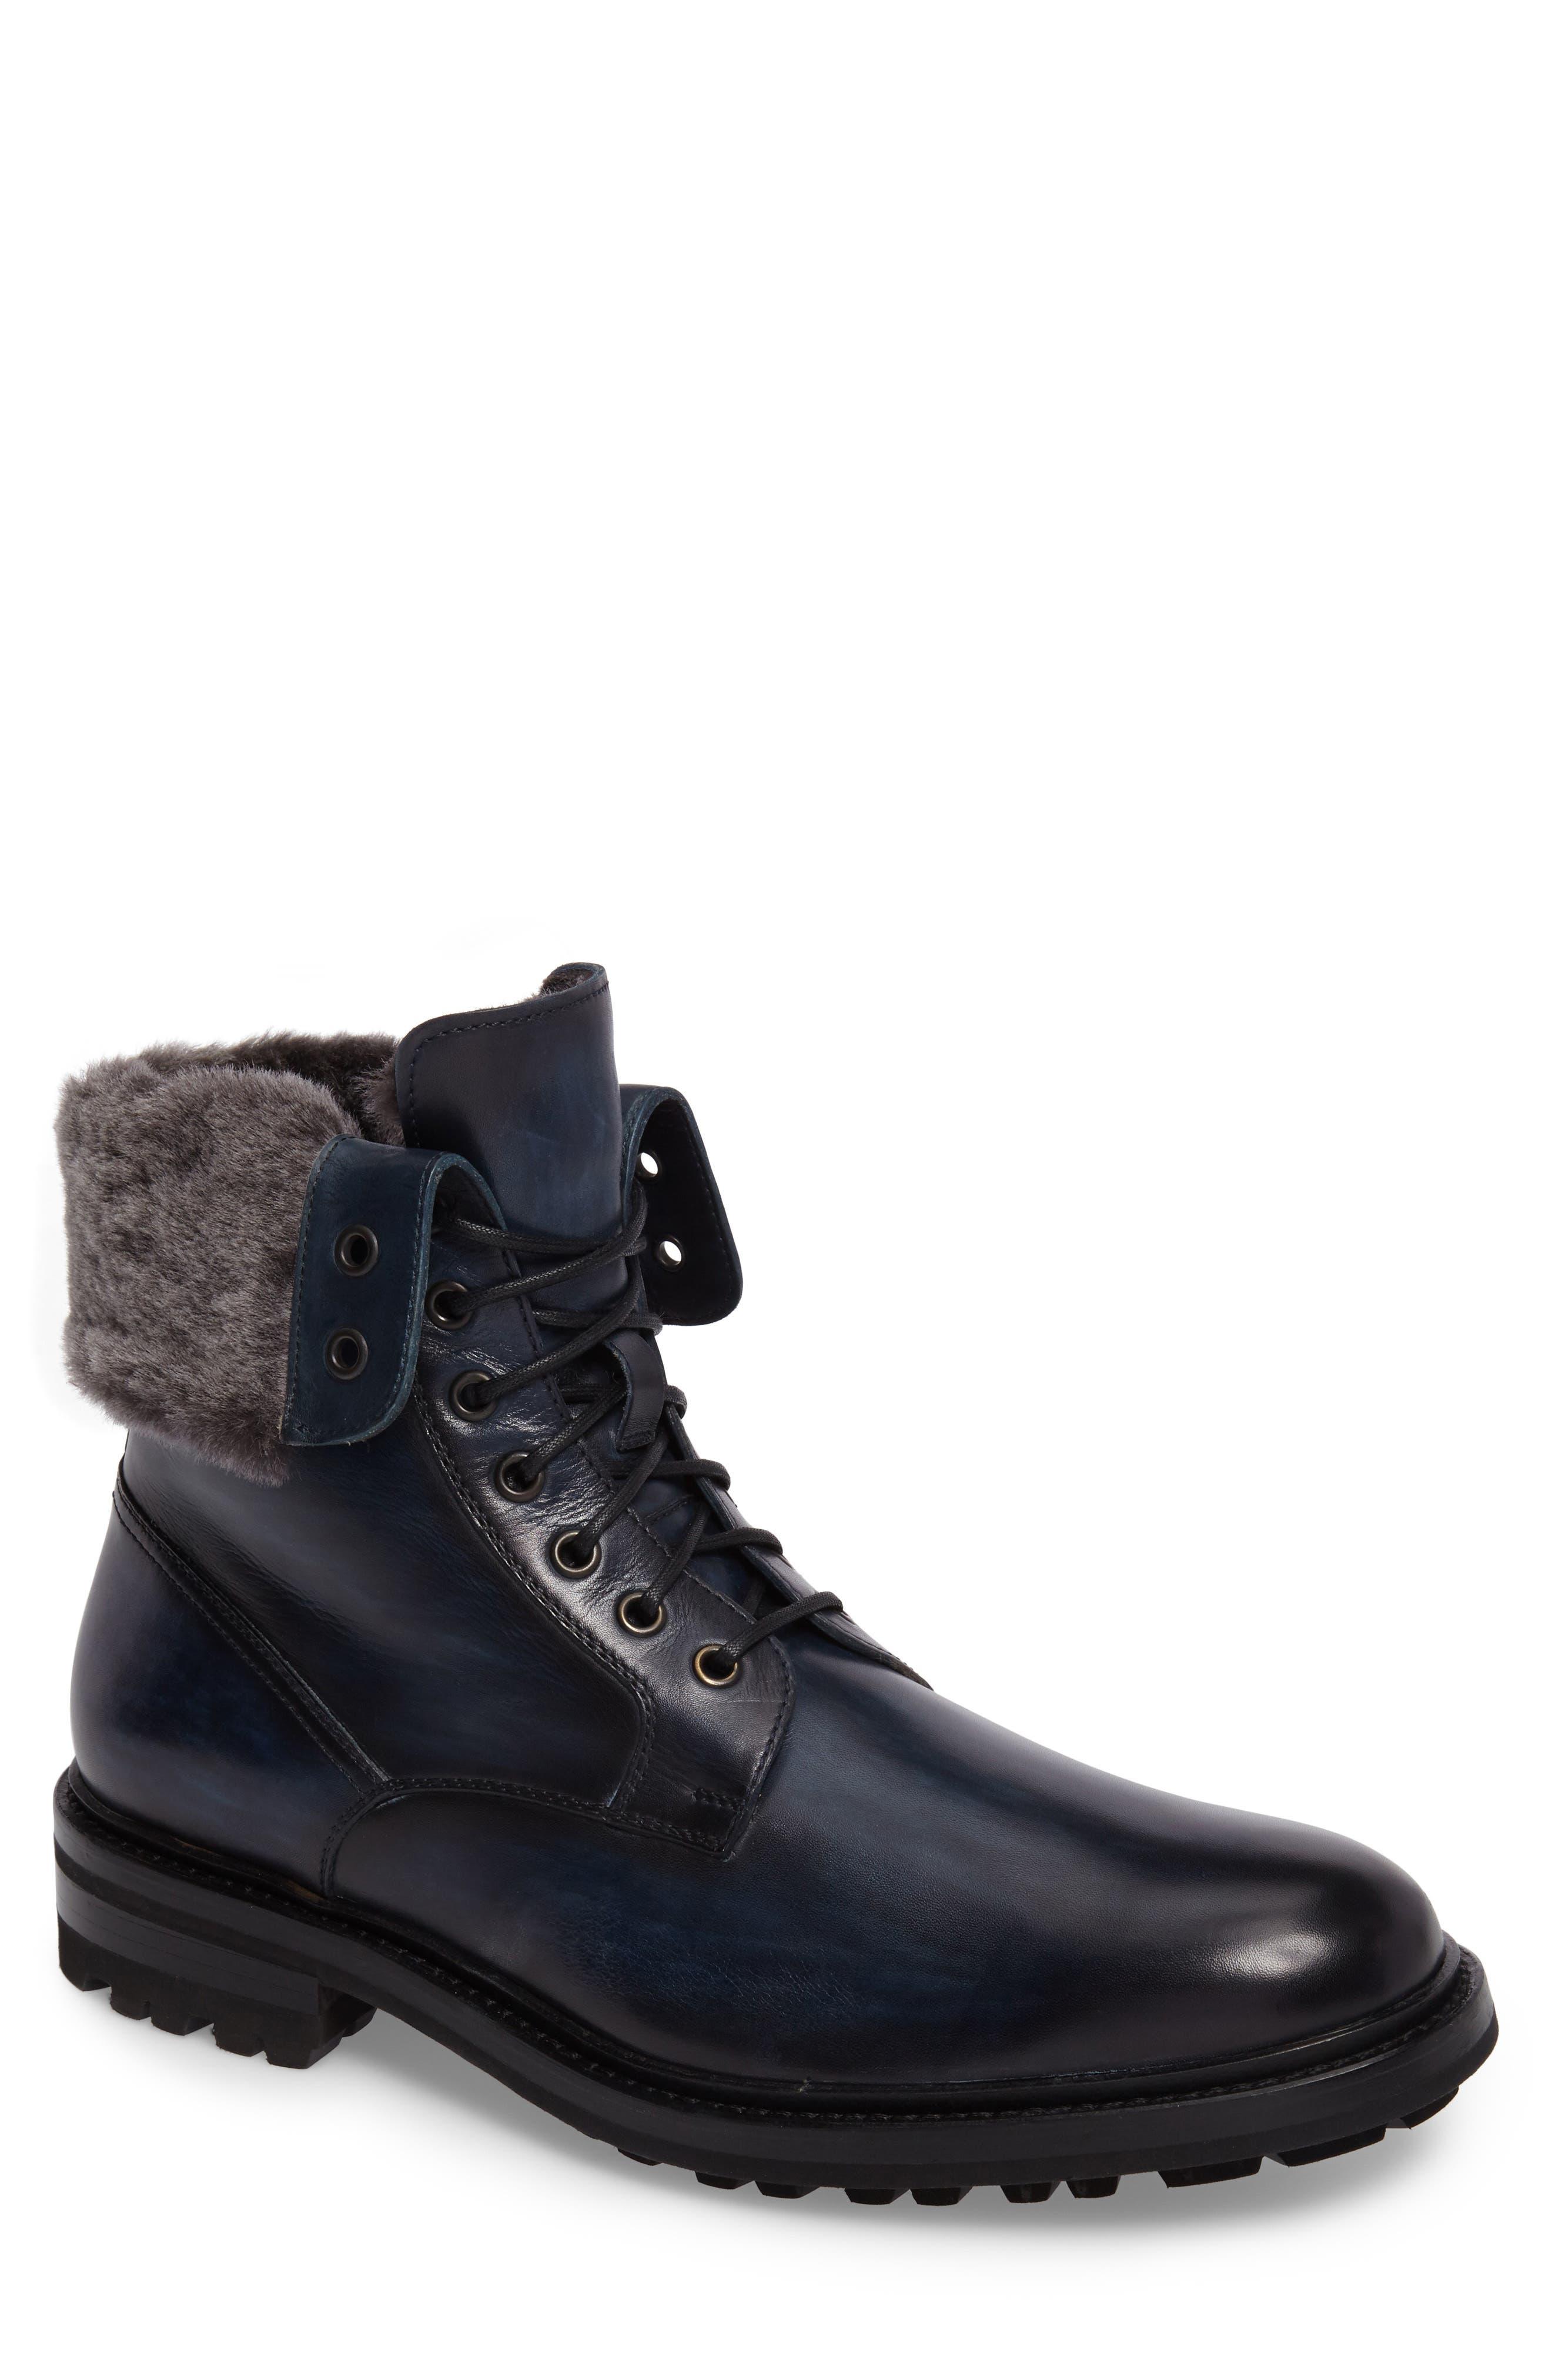 Magnanni Paxton Plain Toe Boot with Genuine Rabbit Fur Cuff (Men)